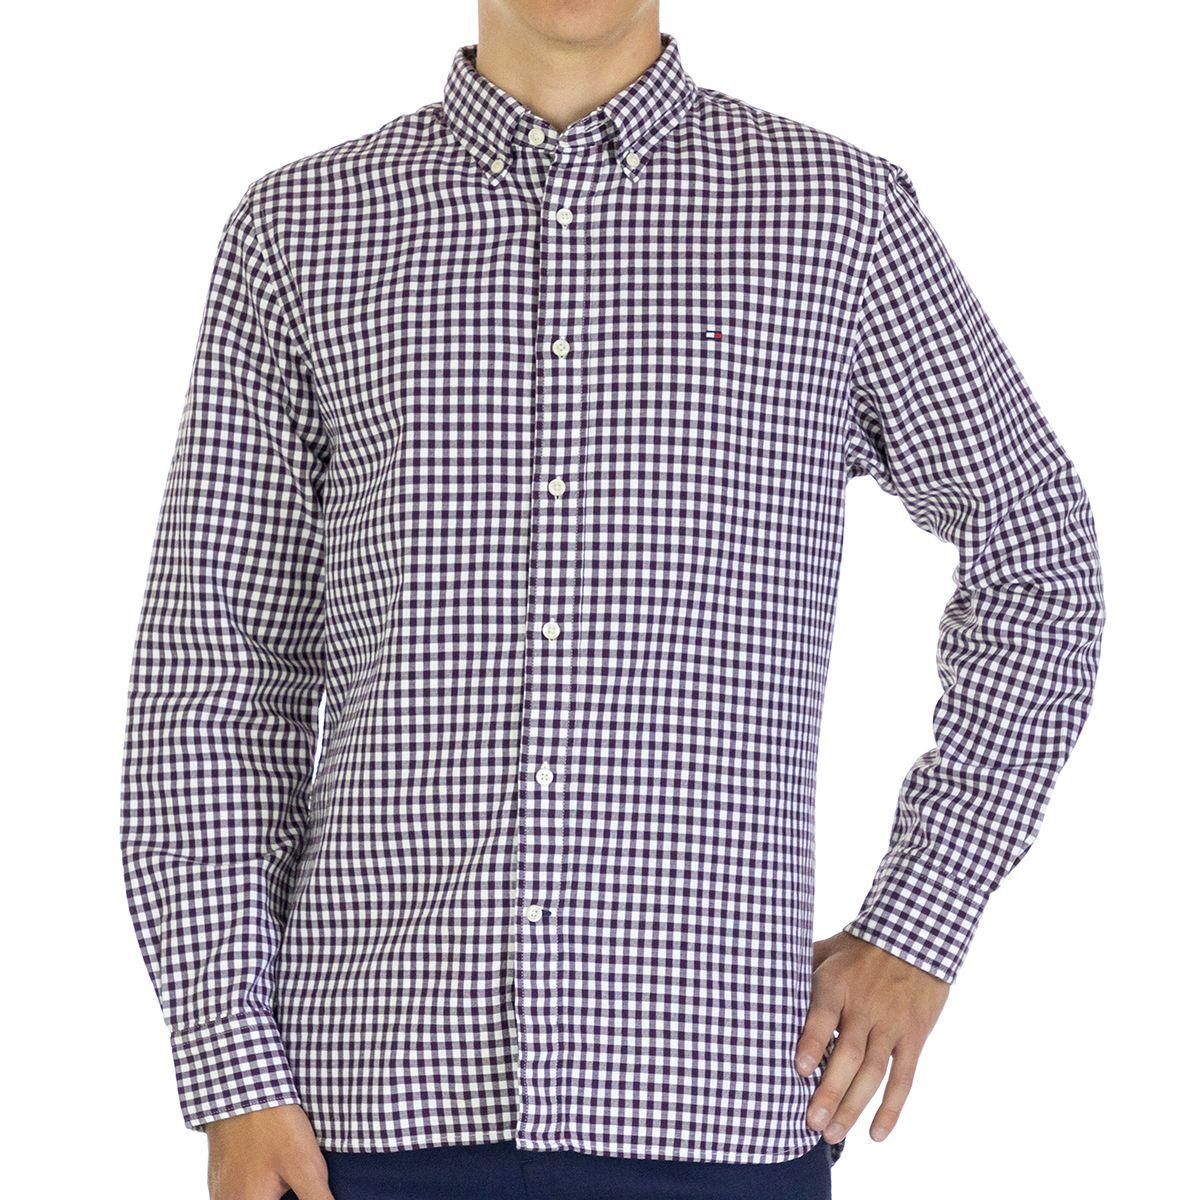 Tommy Hilfiger Men Shirt Regular fit  Full sleeve Multicolor